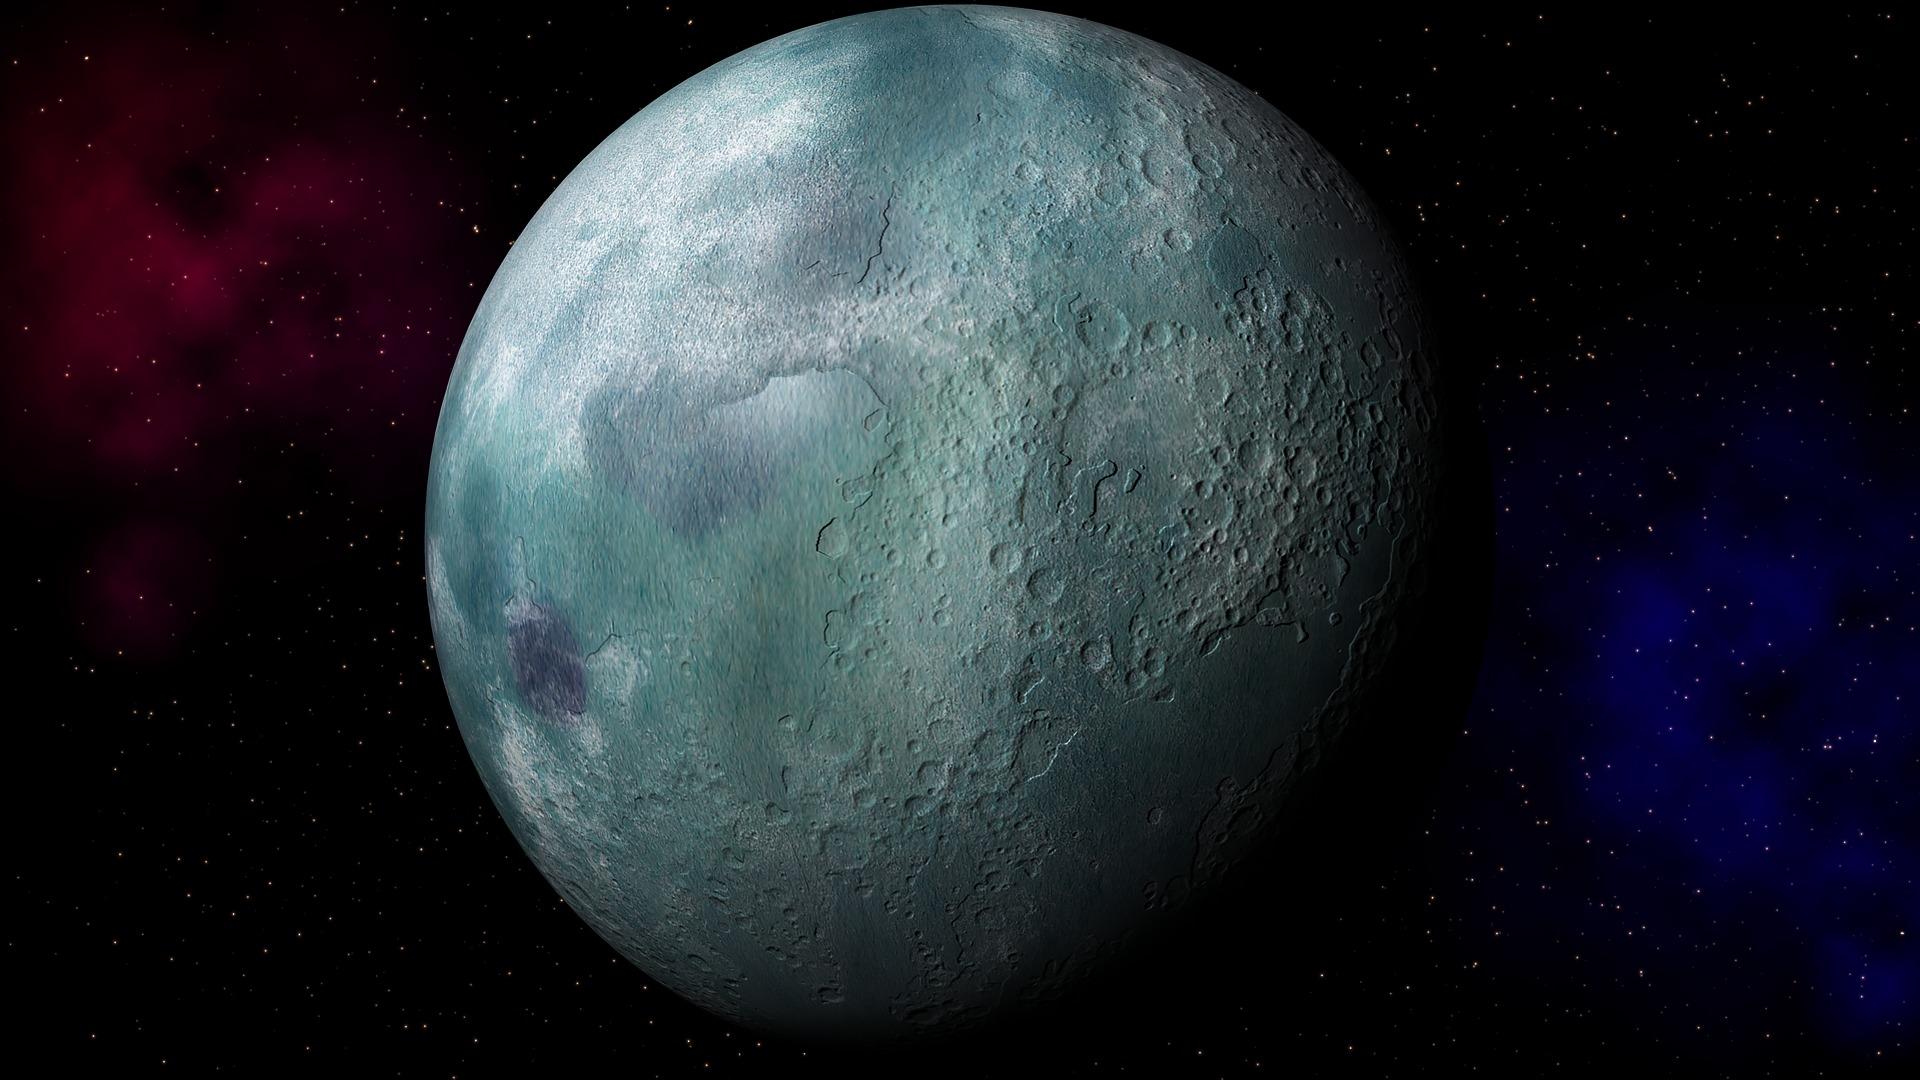 картинка серая планета или накидки